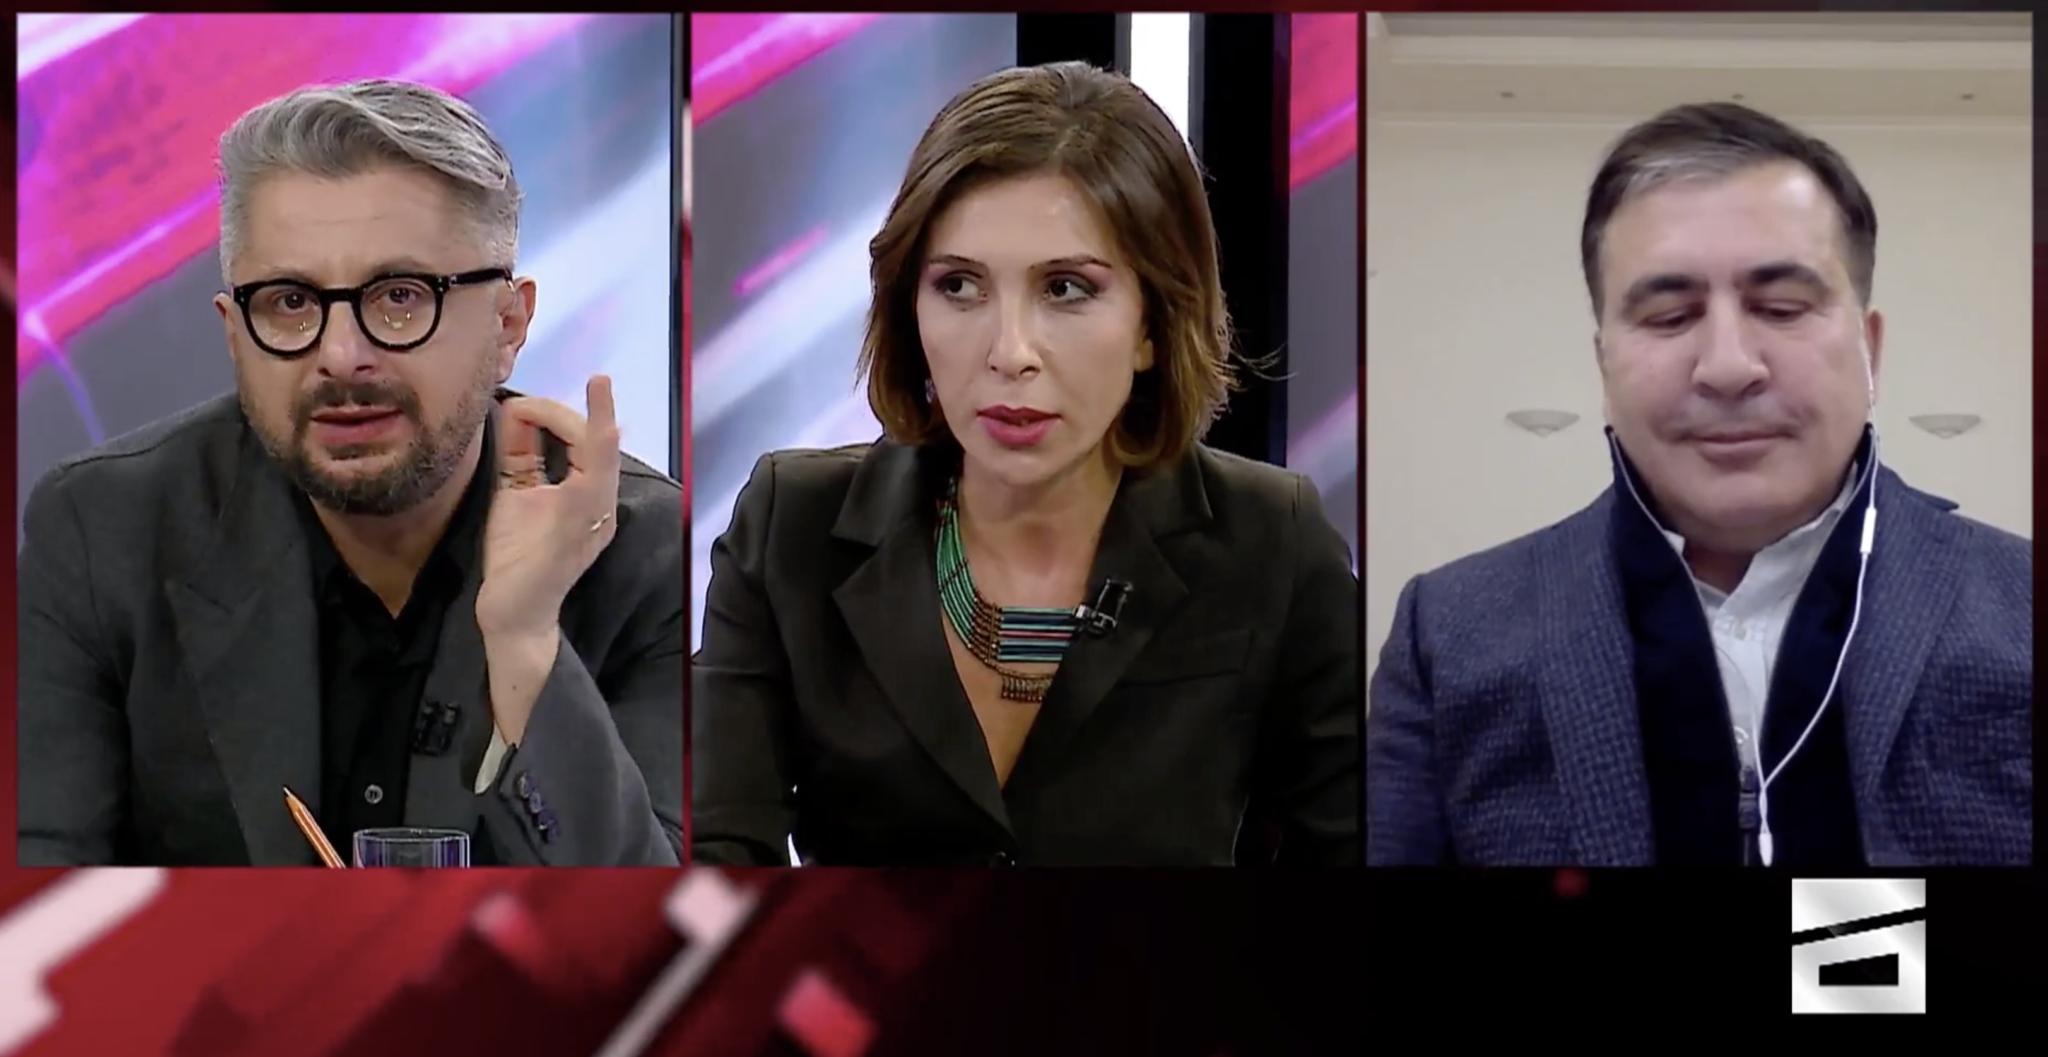 Mixeil Saakaşvili, Nika Gvaramia, Eka Kvesitadzeმიხეილ სააკაშვილი, ნიკა გვარამია, ეკა კვესიტაძე